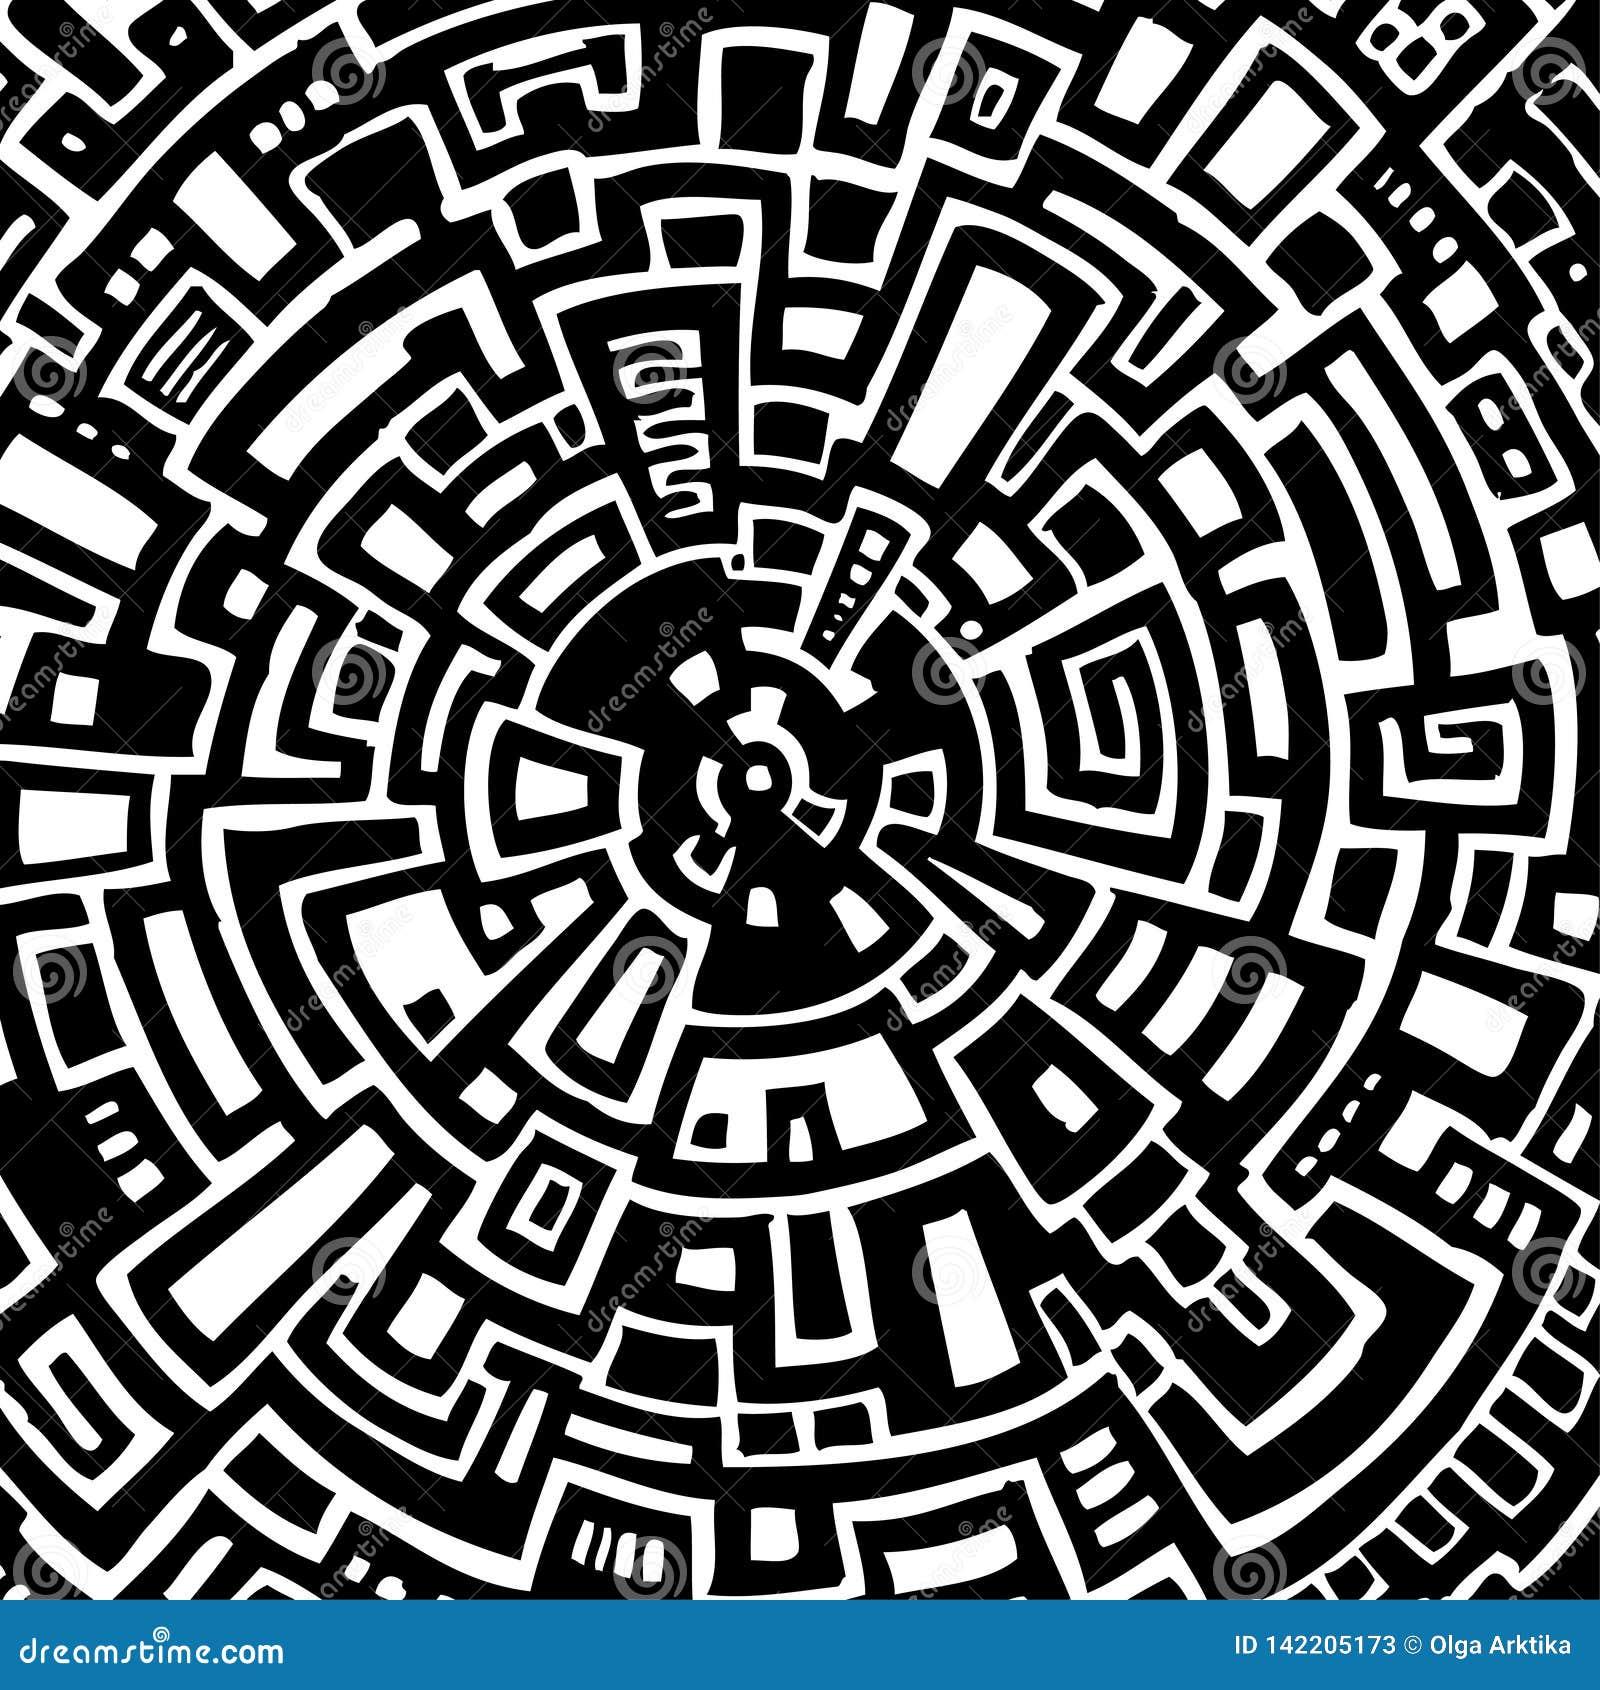 Vektorillustration eines abstrakten Kreislabyrinths